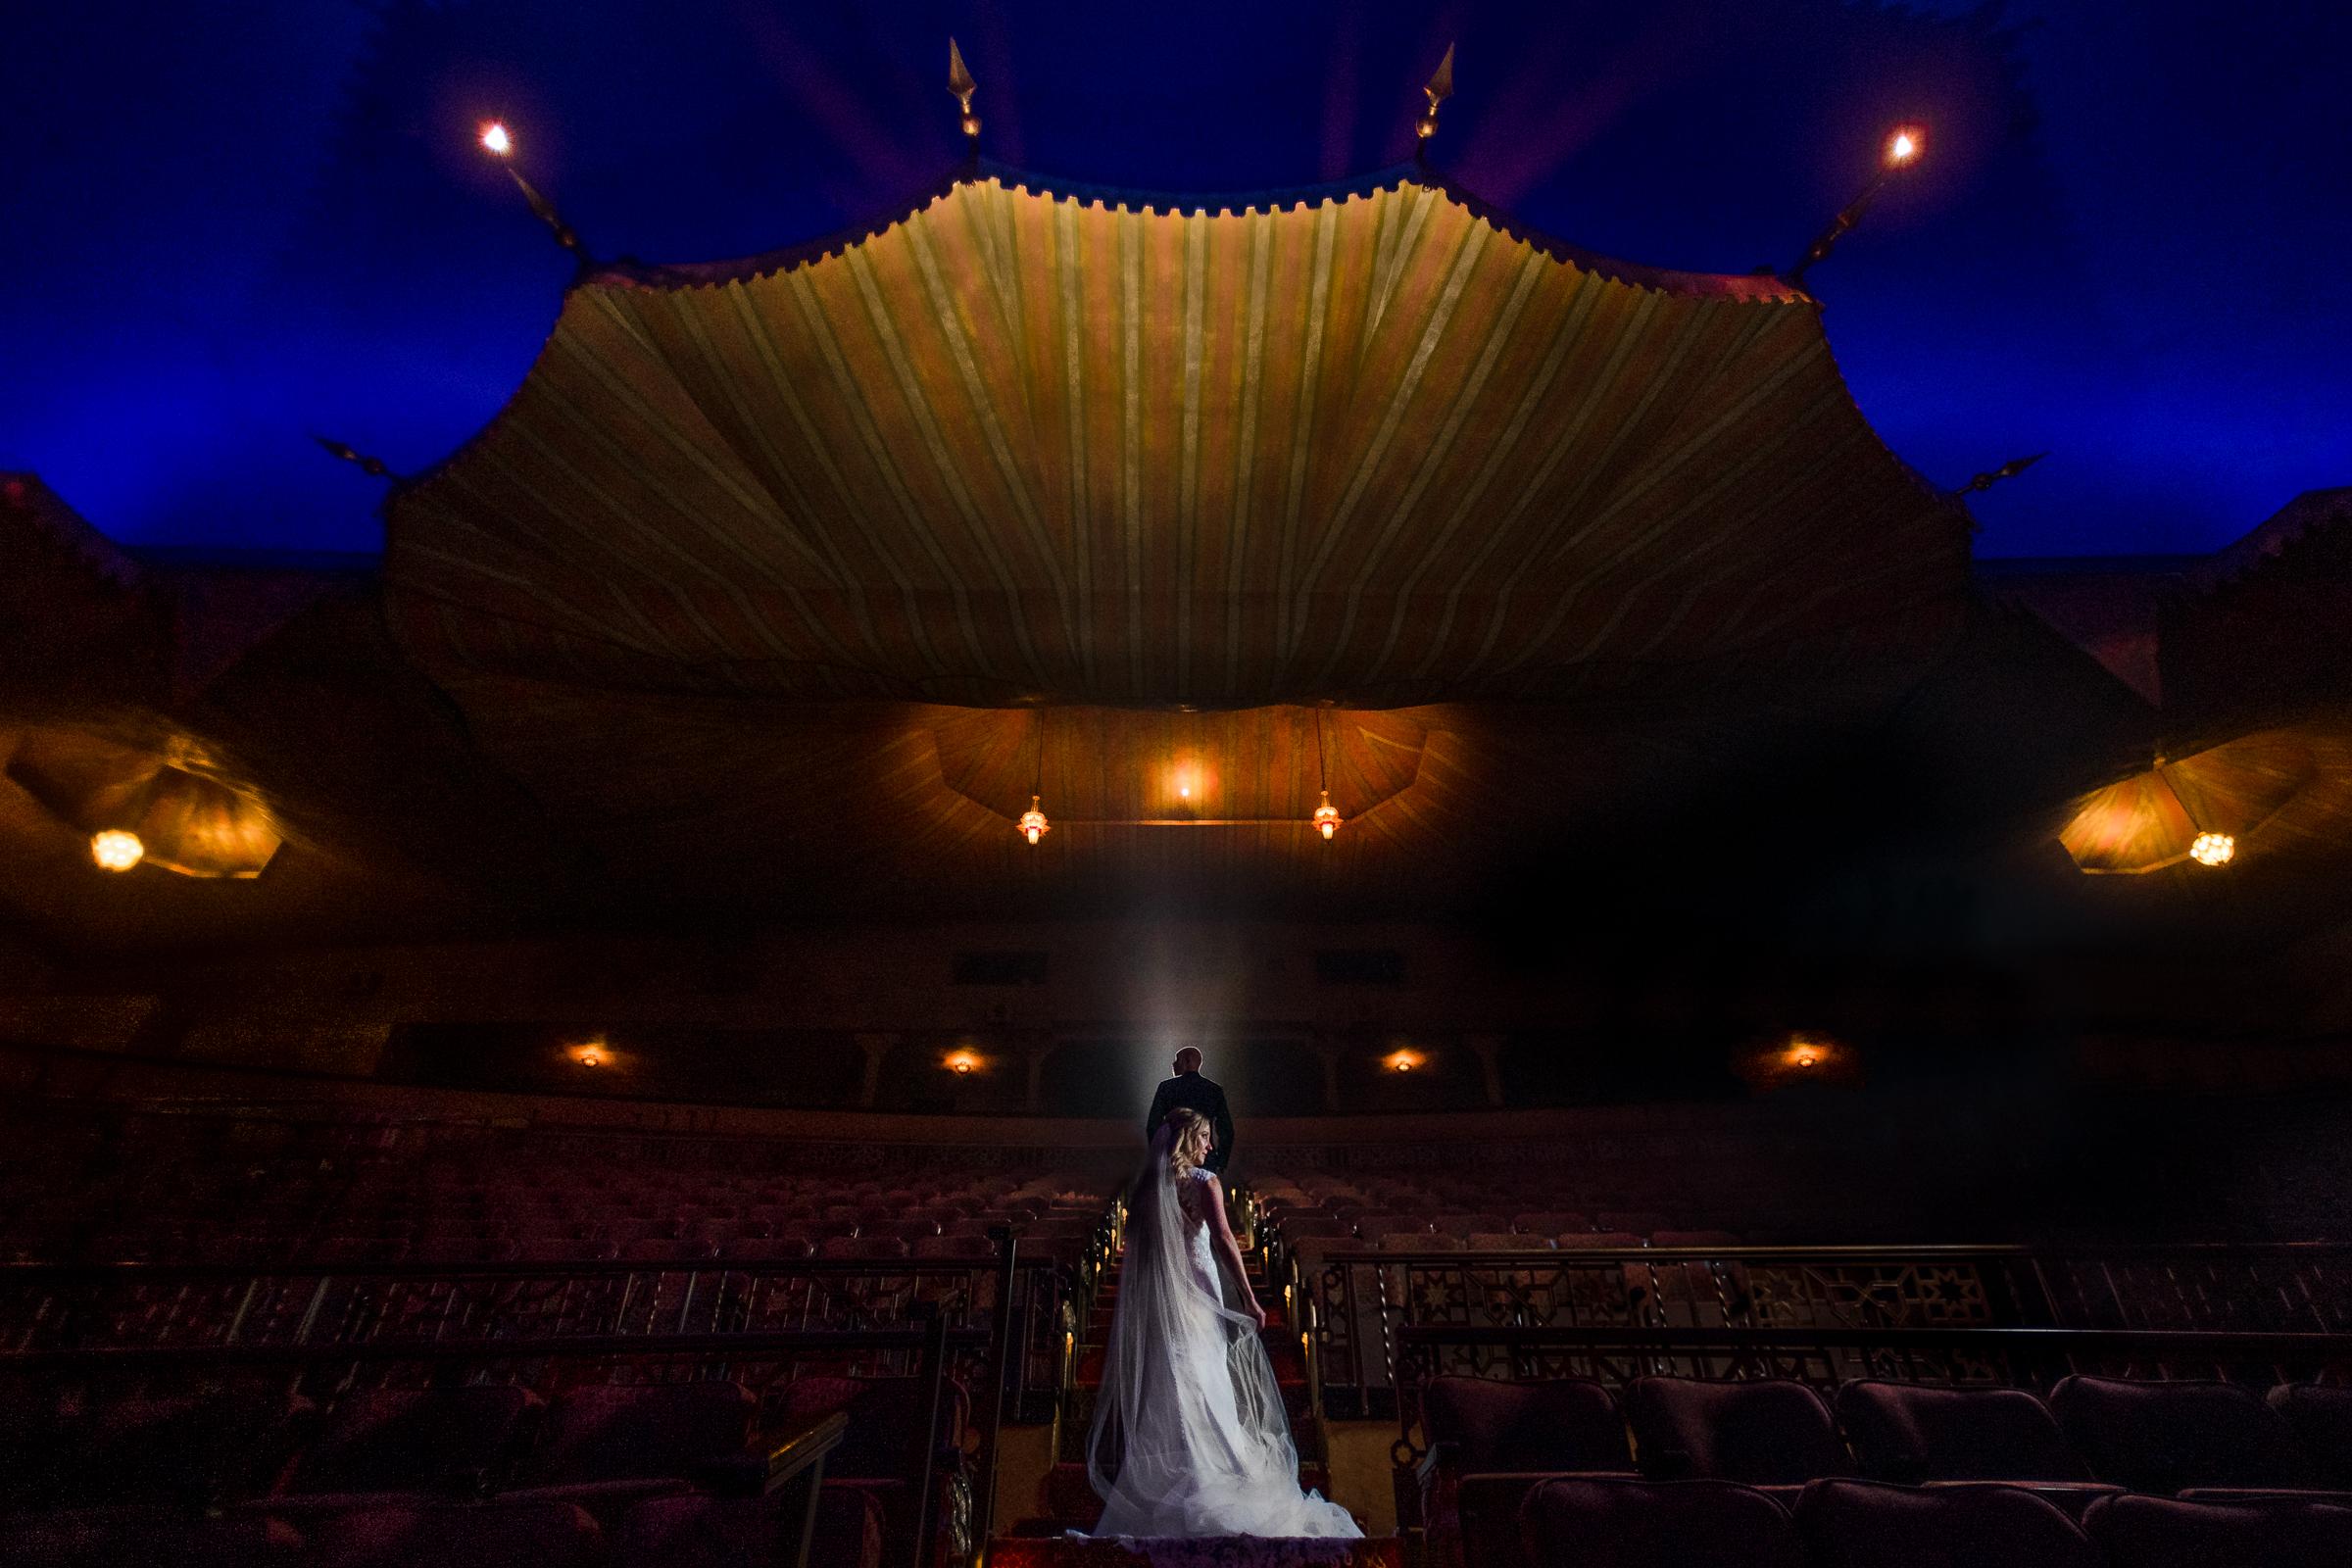 portrait-in-golden-lit-theatre-viridian-images-photography-florida